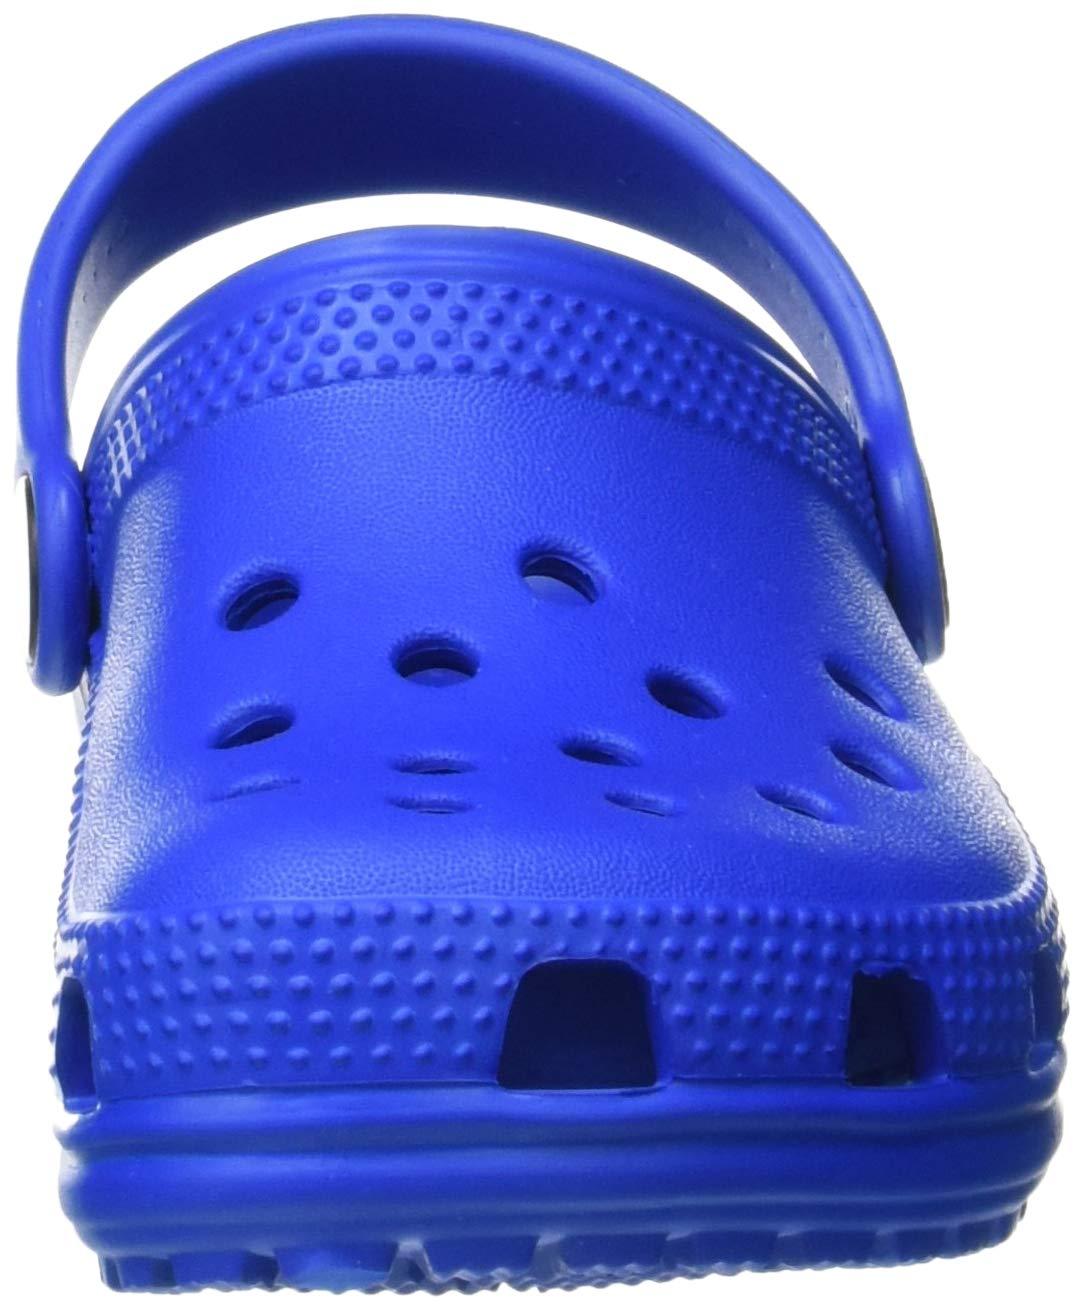 Crocs Classic Clog, Bright Cobalt, 13 M US Little Kid by Crocs (Image #4)